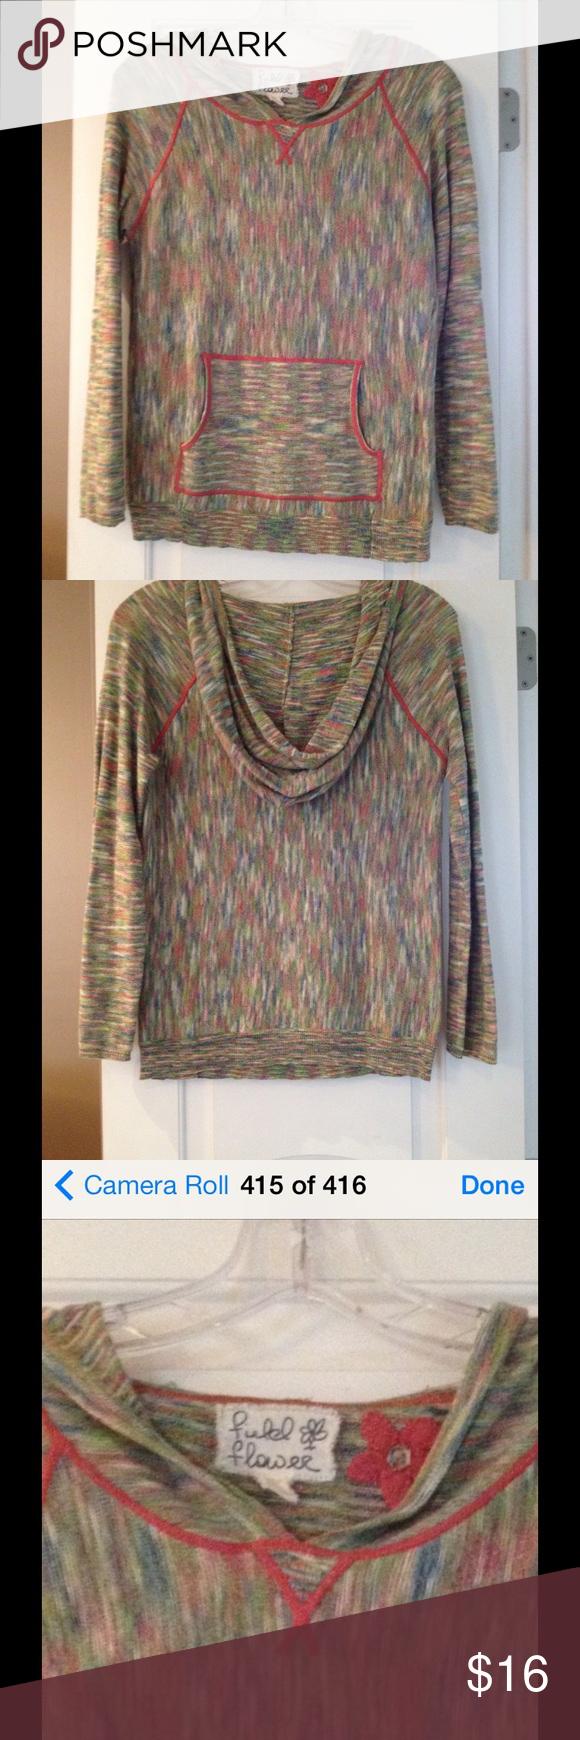 Anthropologie field flower🌸 hoodie size XS | Colors, Hoodies and ...